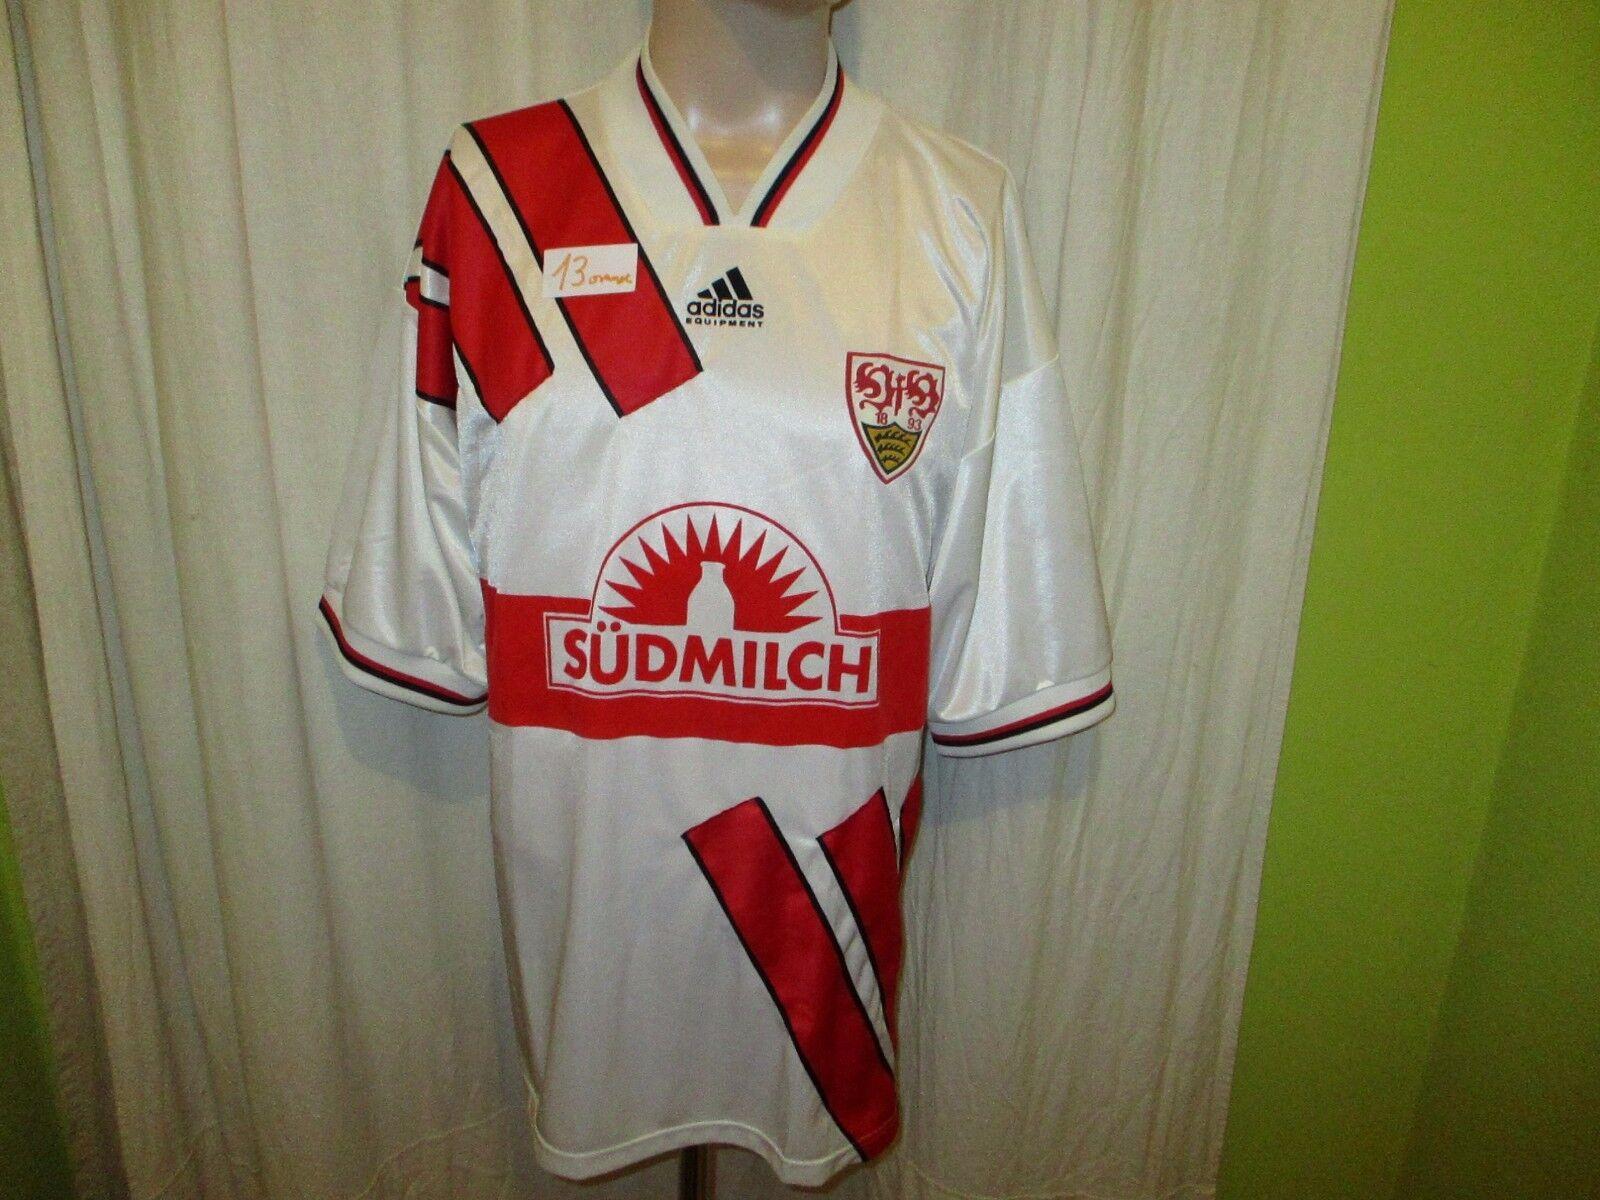 VfB Stuttgart Adidas Heim Trikot 1994 95  Südmilch  + Handigniert Gr.XL TOP